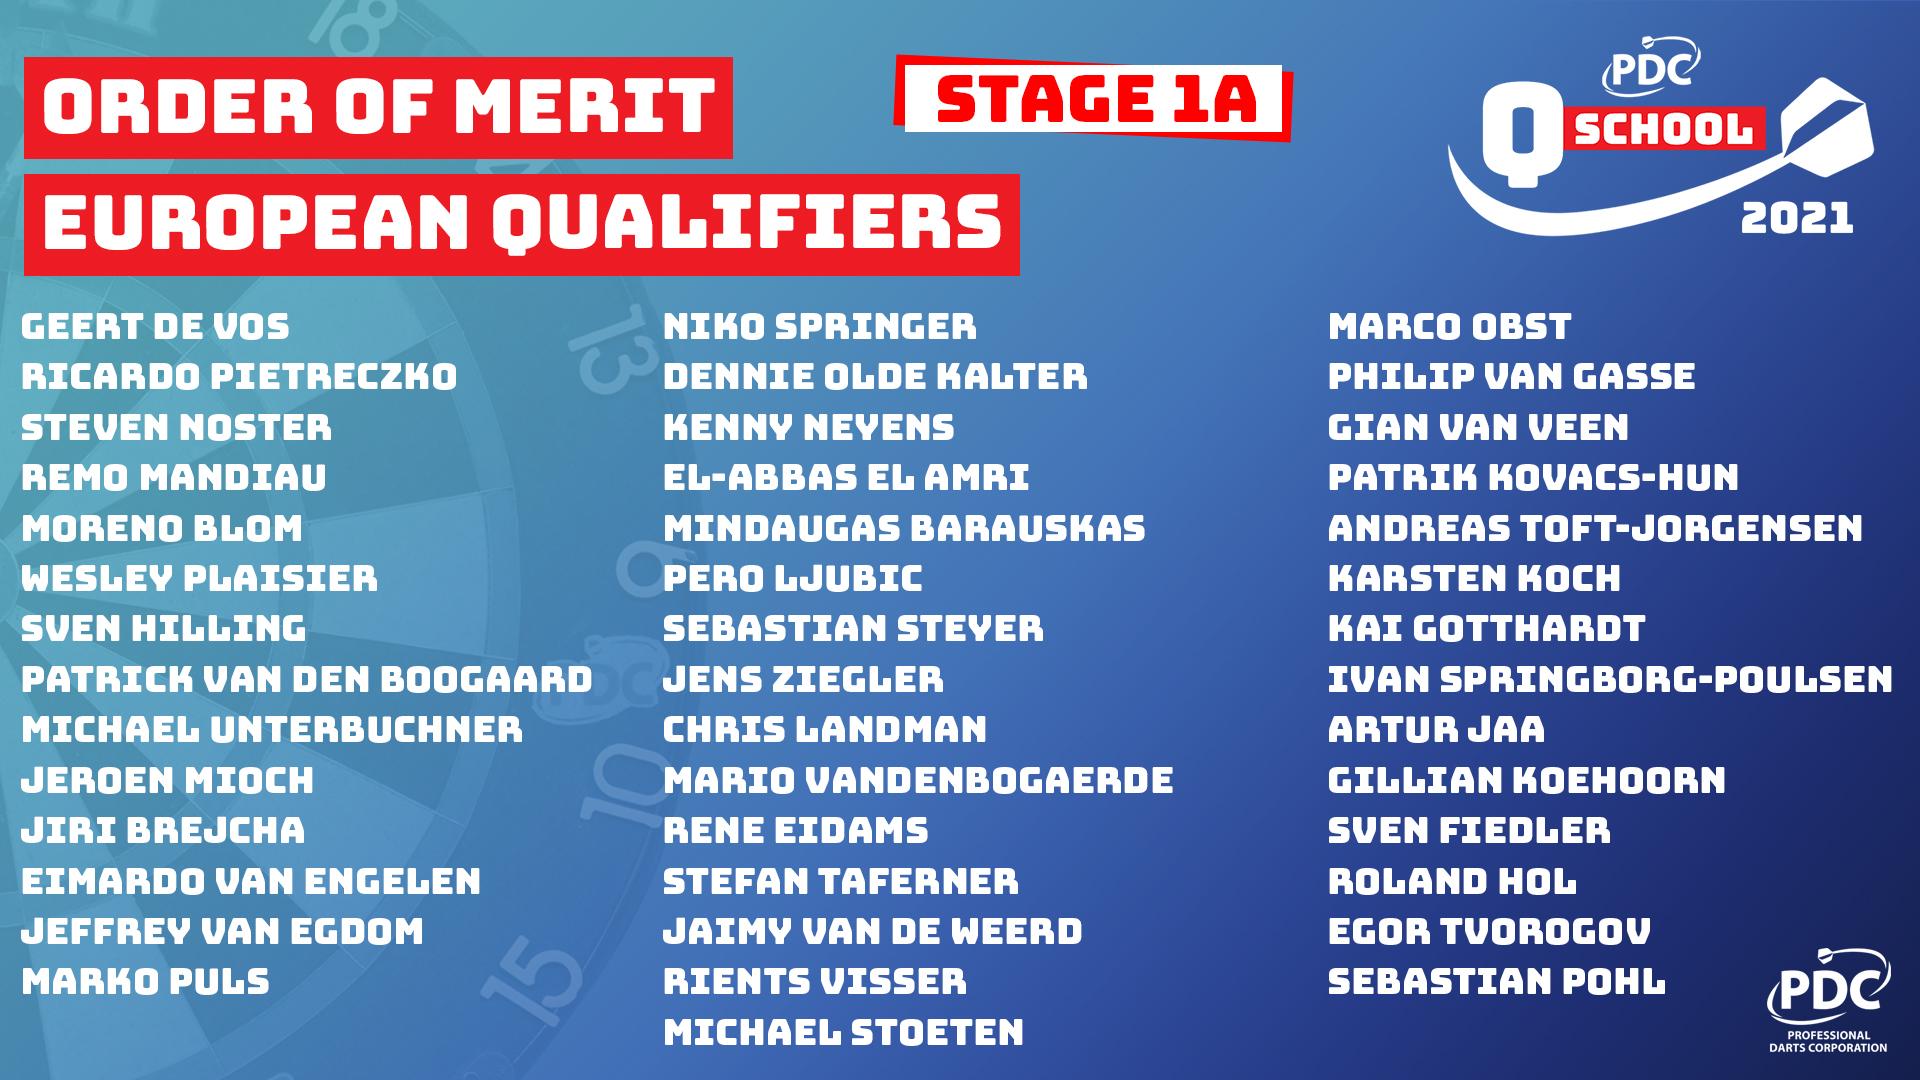 European Stage 1A Order of Merit